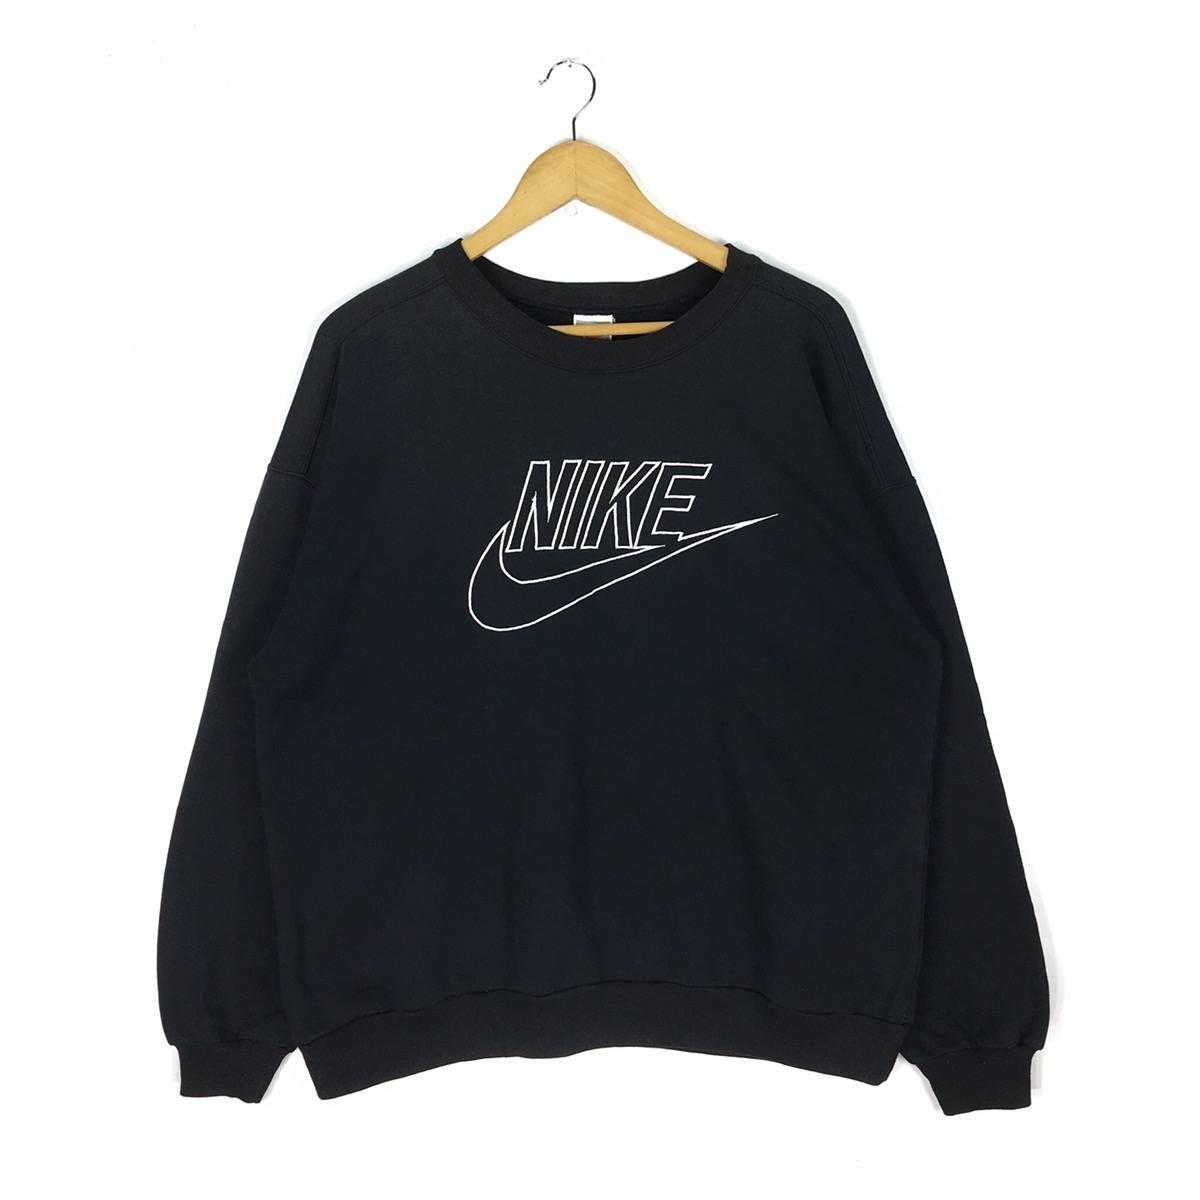 Nike Vintage Nike Grey Tag Big Swoos Crewneck Made In Australia Size L Sweatshirts Hoodies For Sale Grail Vintage Hoodies Vintage Nike Sweatshirt Clothes